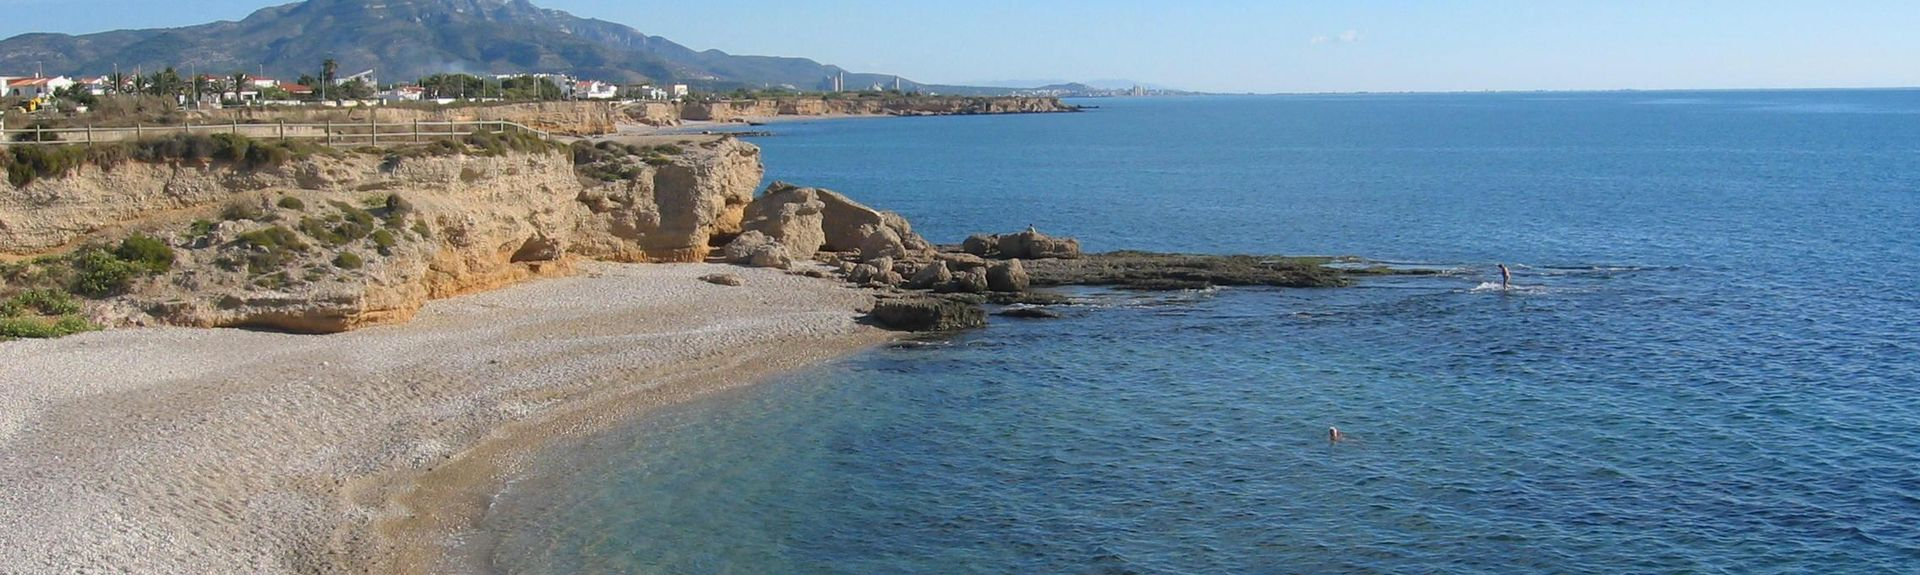 Godall, Catalogne, Espagne